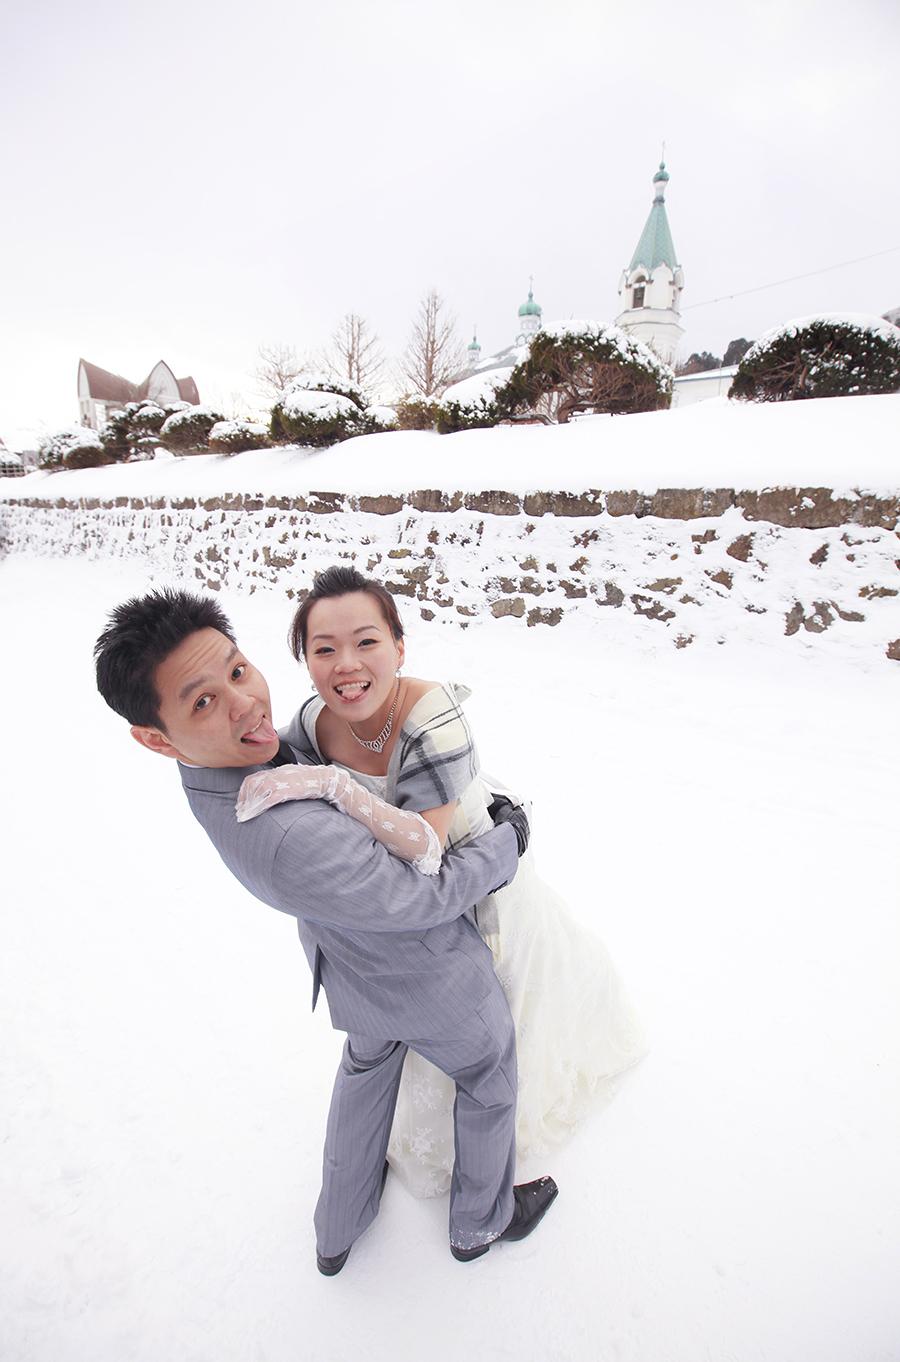 hokkaido tokyo japan . wedding photography by kurt ahs . 5065.jpg